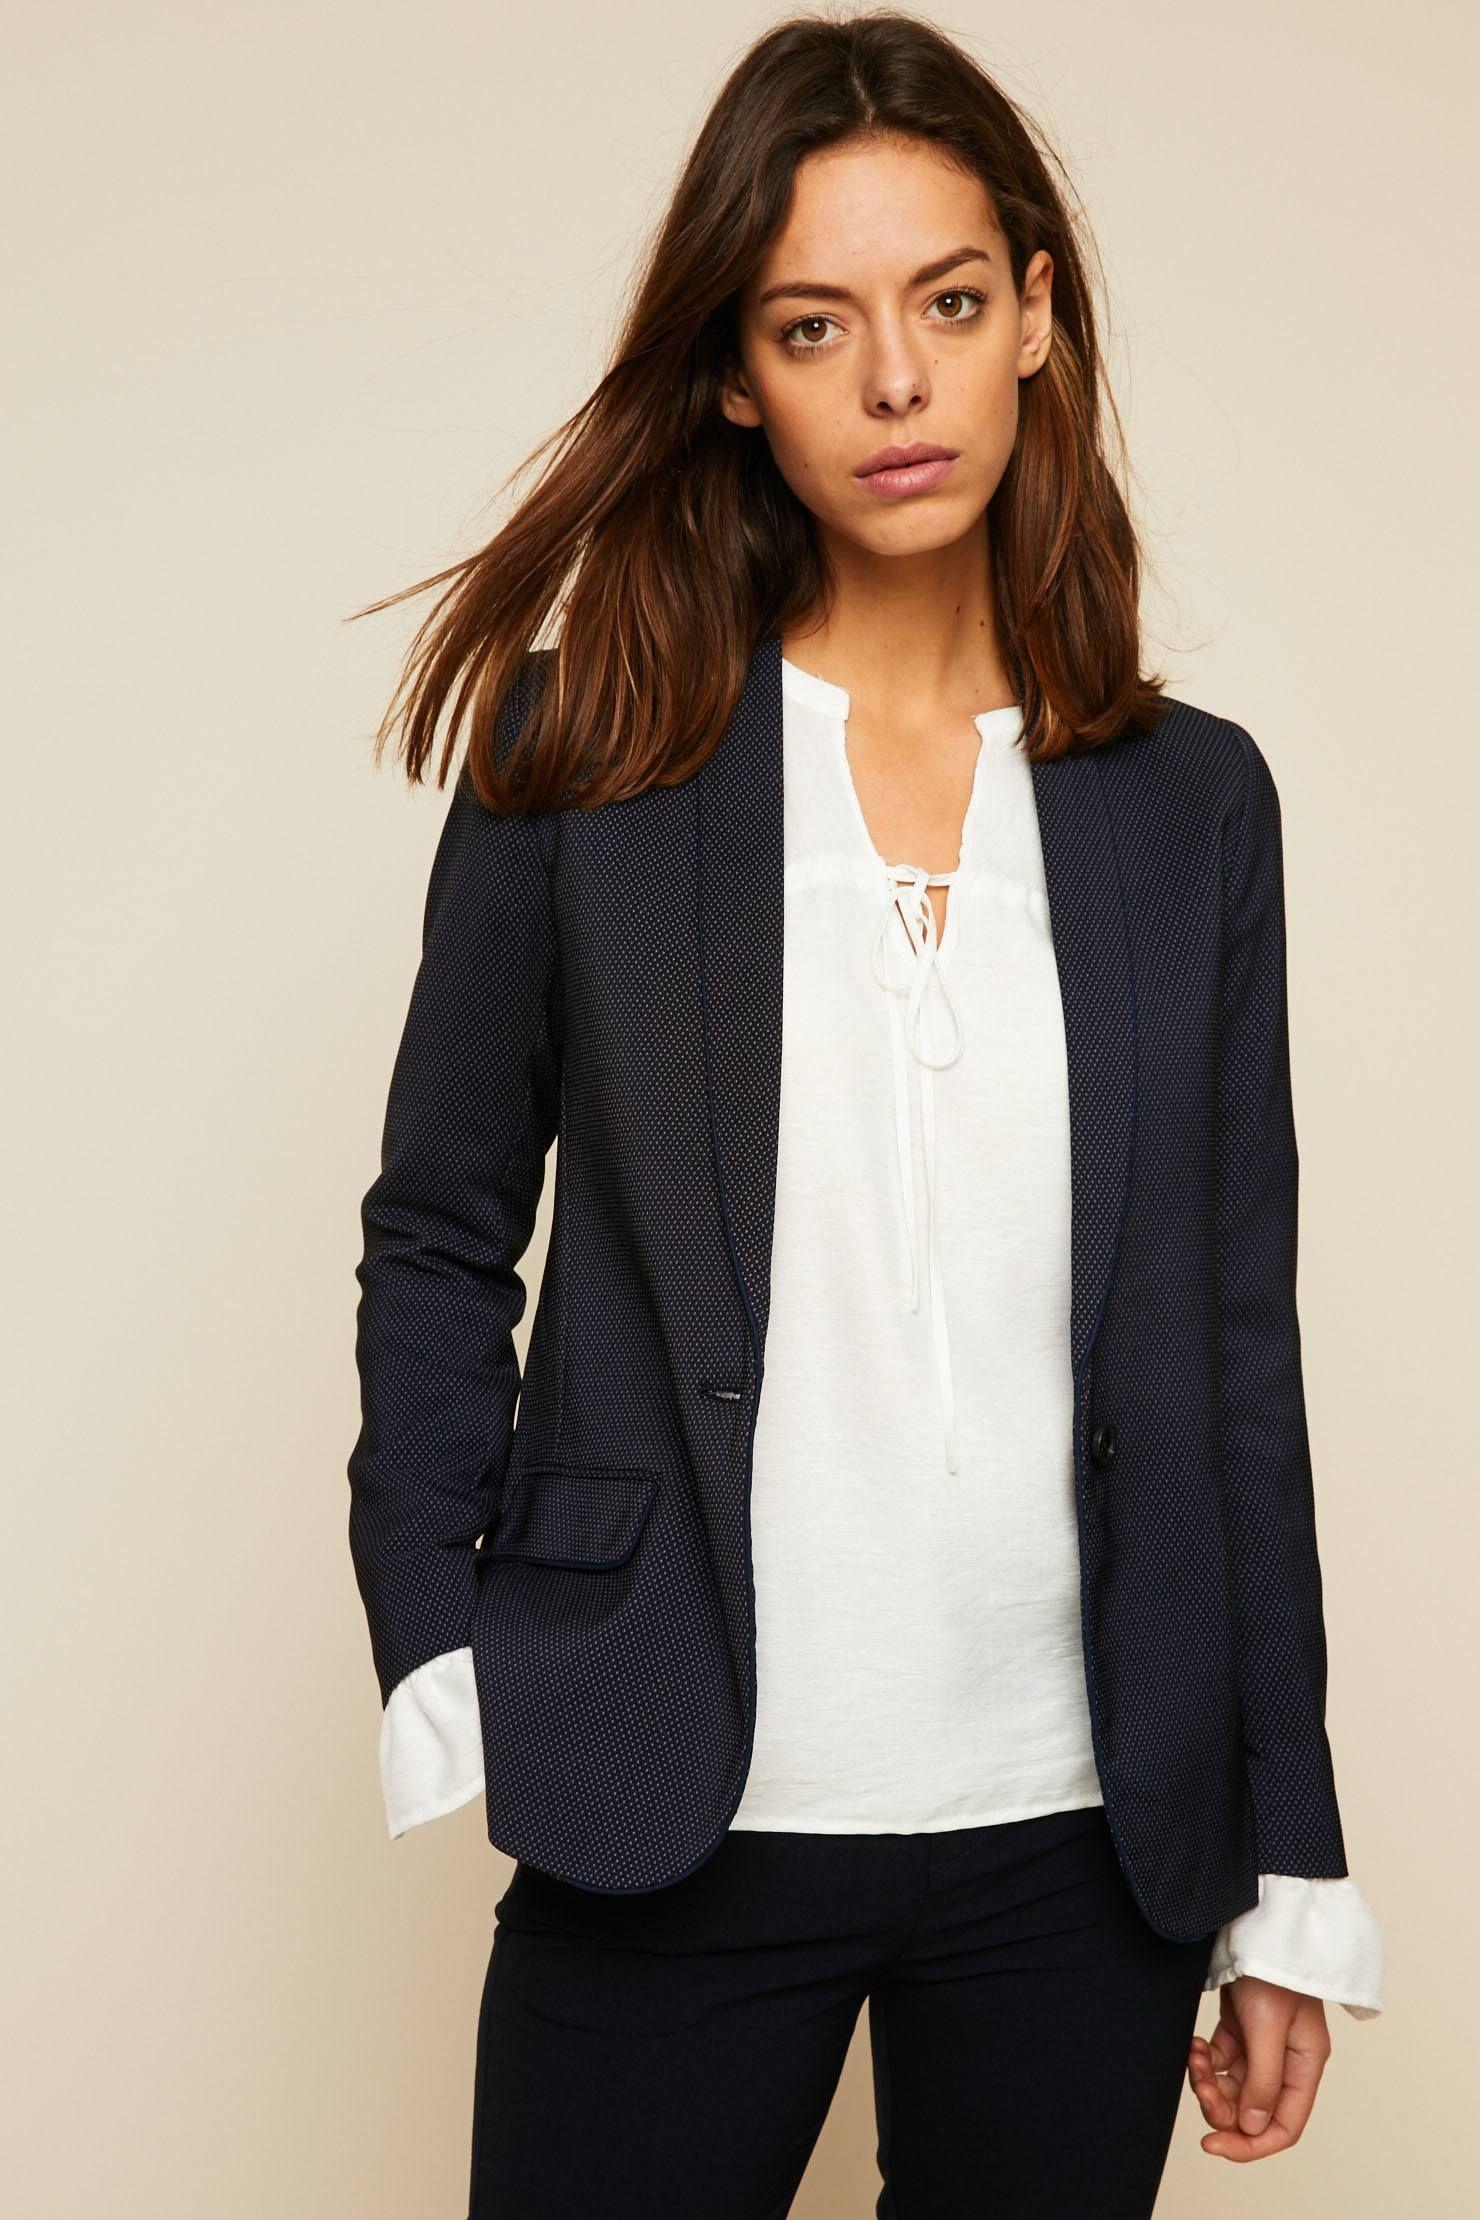 best service 22cca fe89a Mkt studio Viraille Veste blazer à pois bleu marine prix Veste Femme  Monshowroom 189.00 € TTC